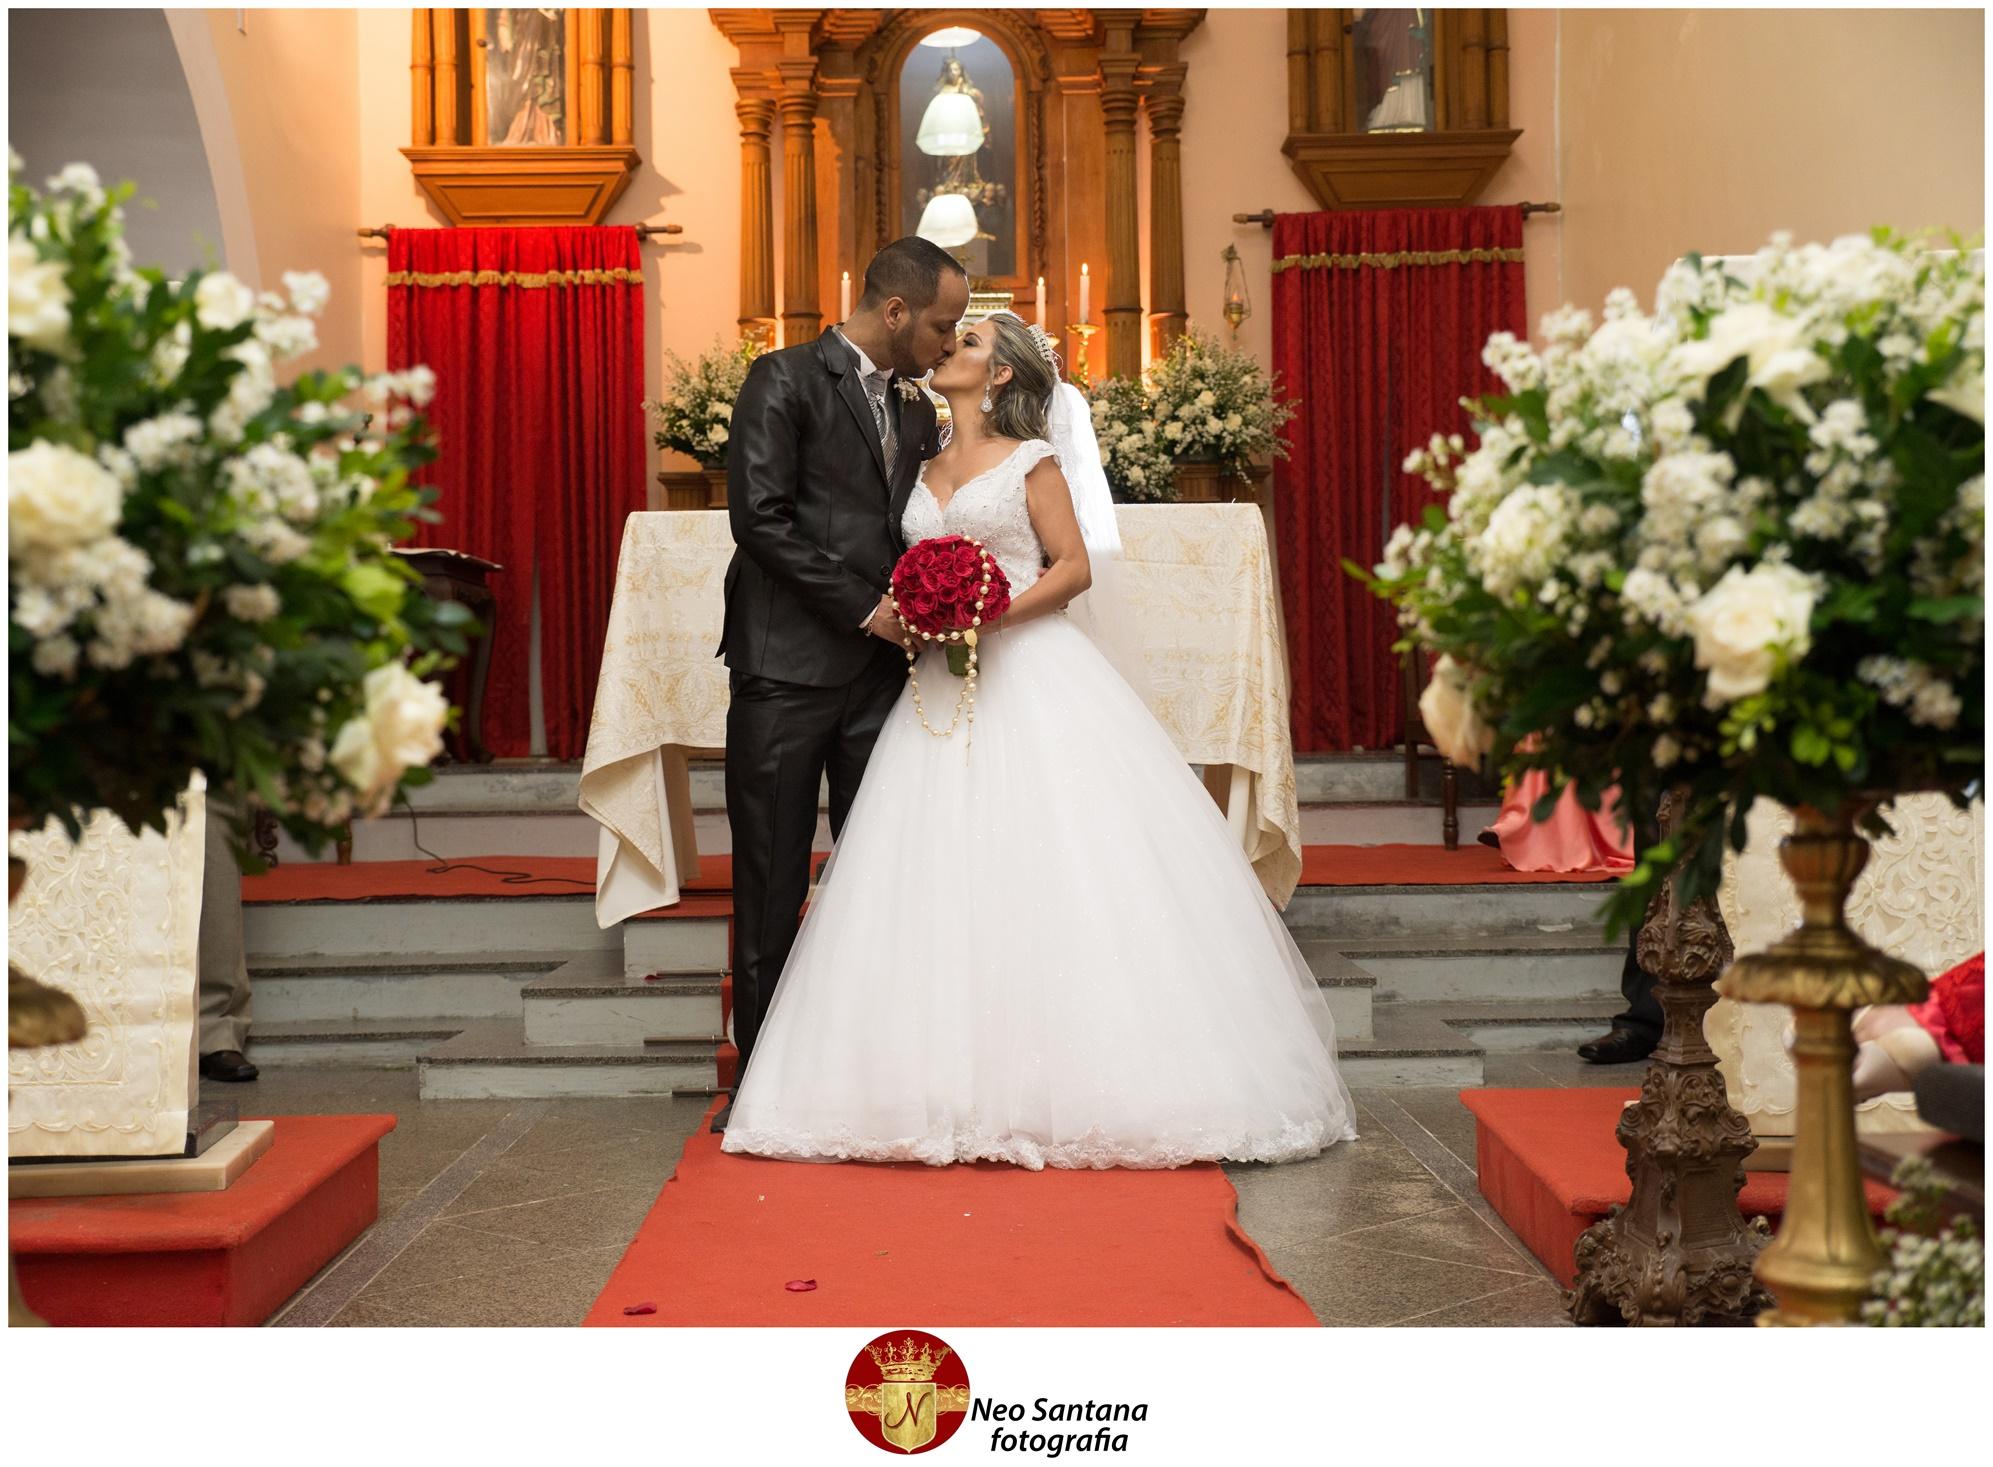 Cristina e Marcos